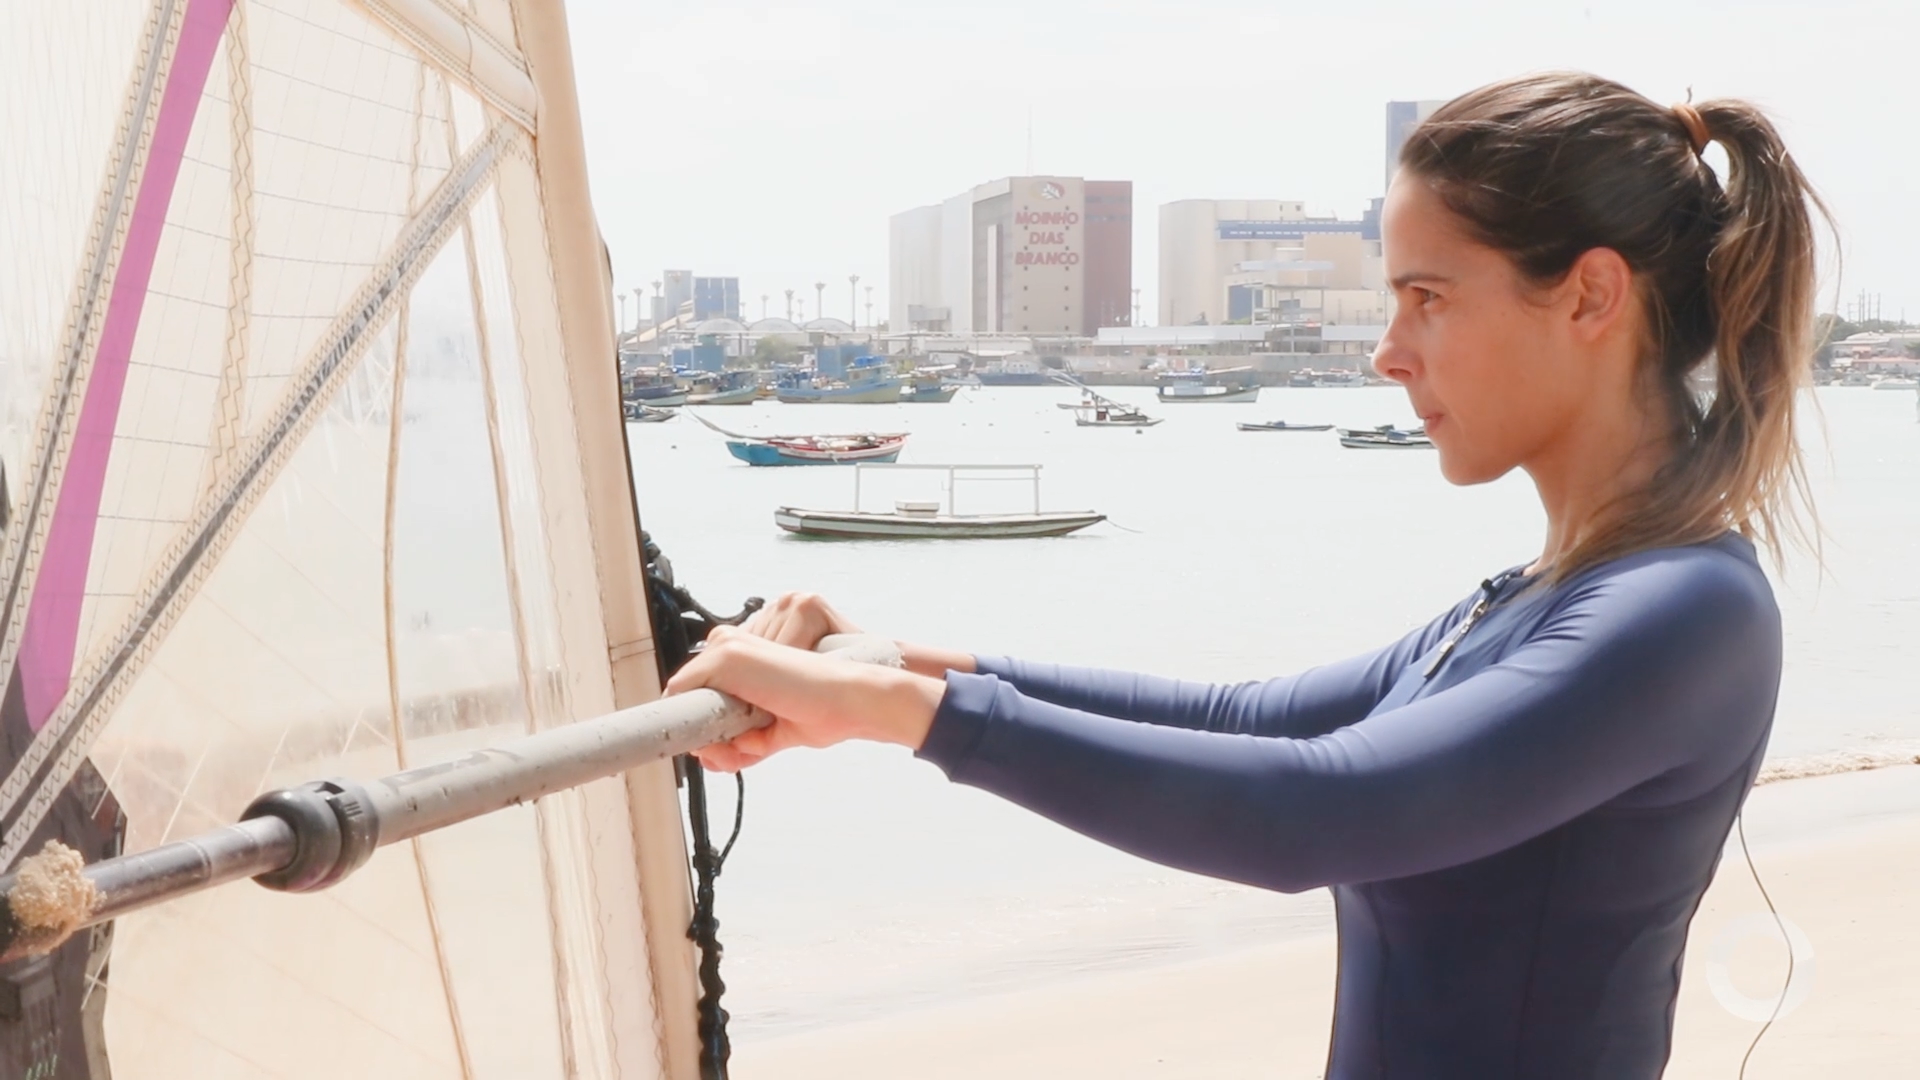 Costume Saudável – Joana Ramalho experimenta aula de Wing Surf